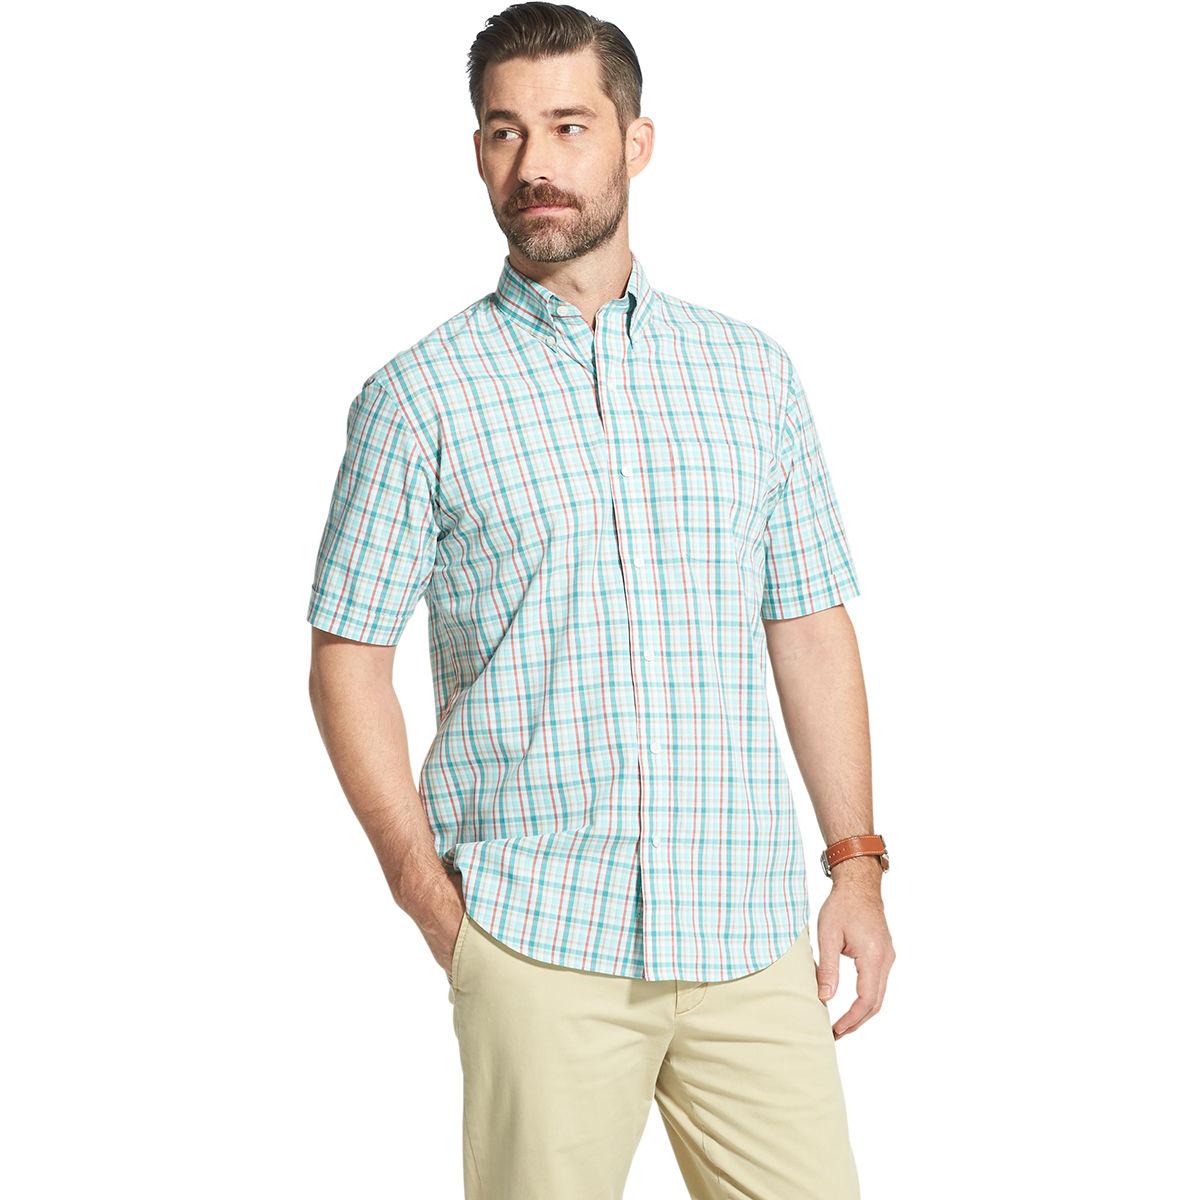 Arrow Men's Hamilton Poplin Plaid Short-Sleeve Button Down Shirt - Green, XL